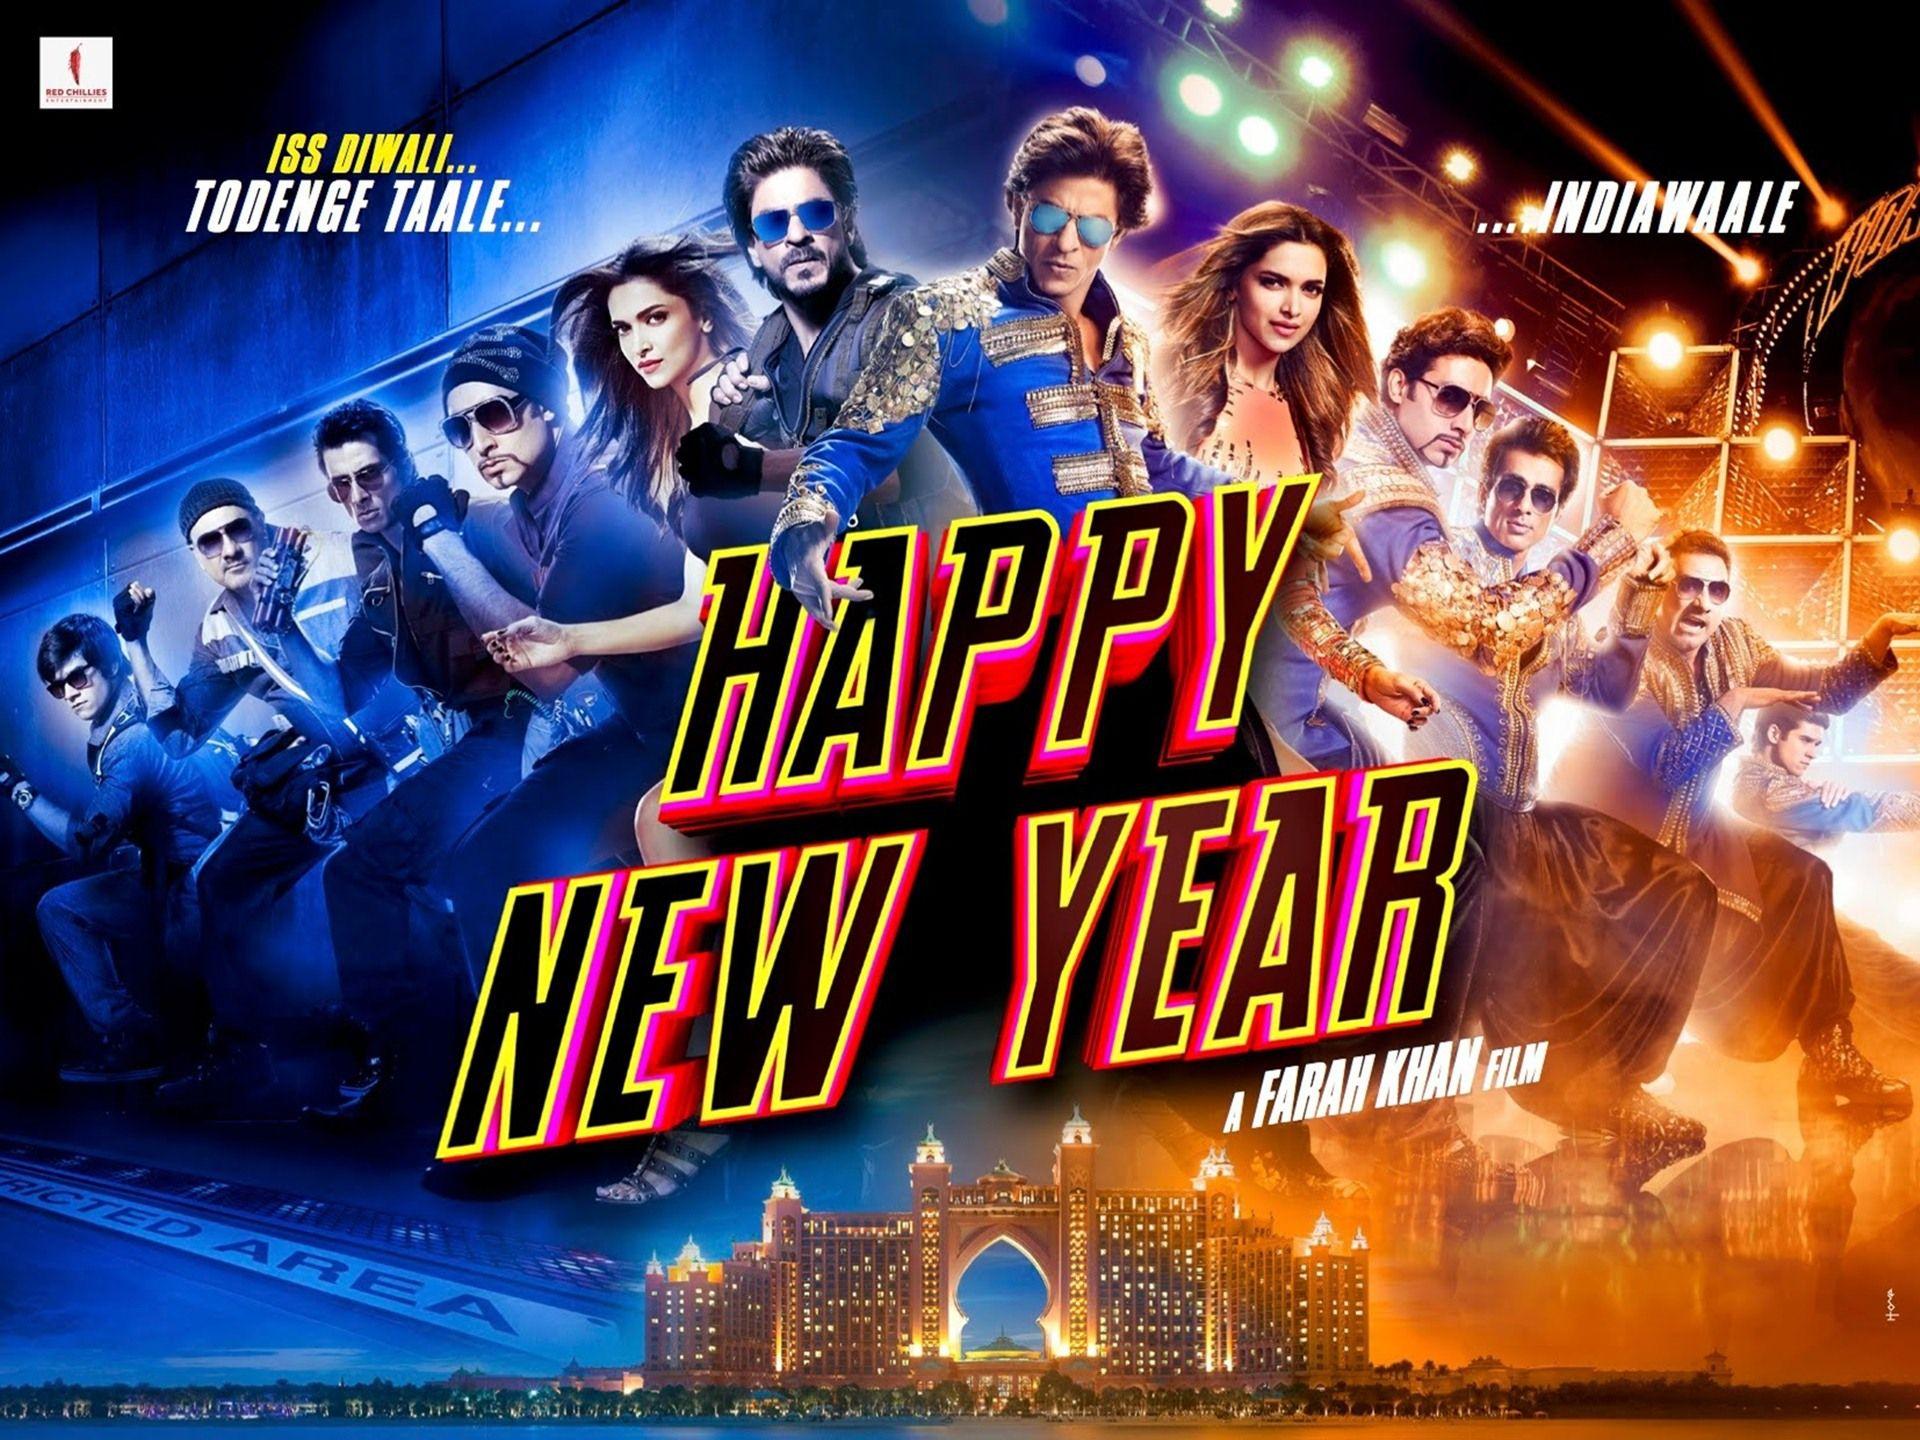 Jappy Deine Happy new year film